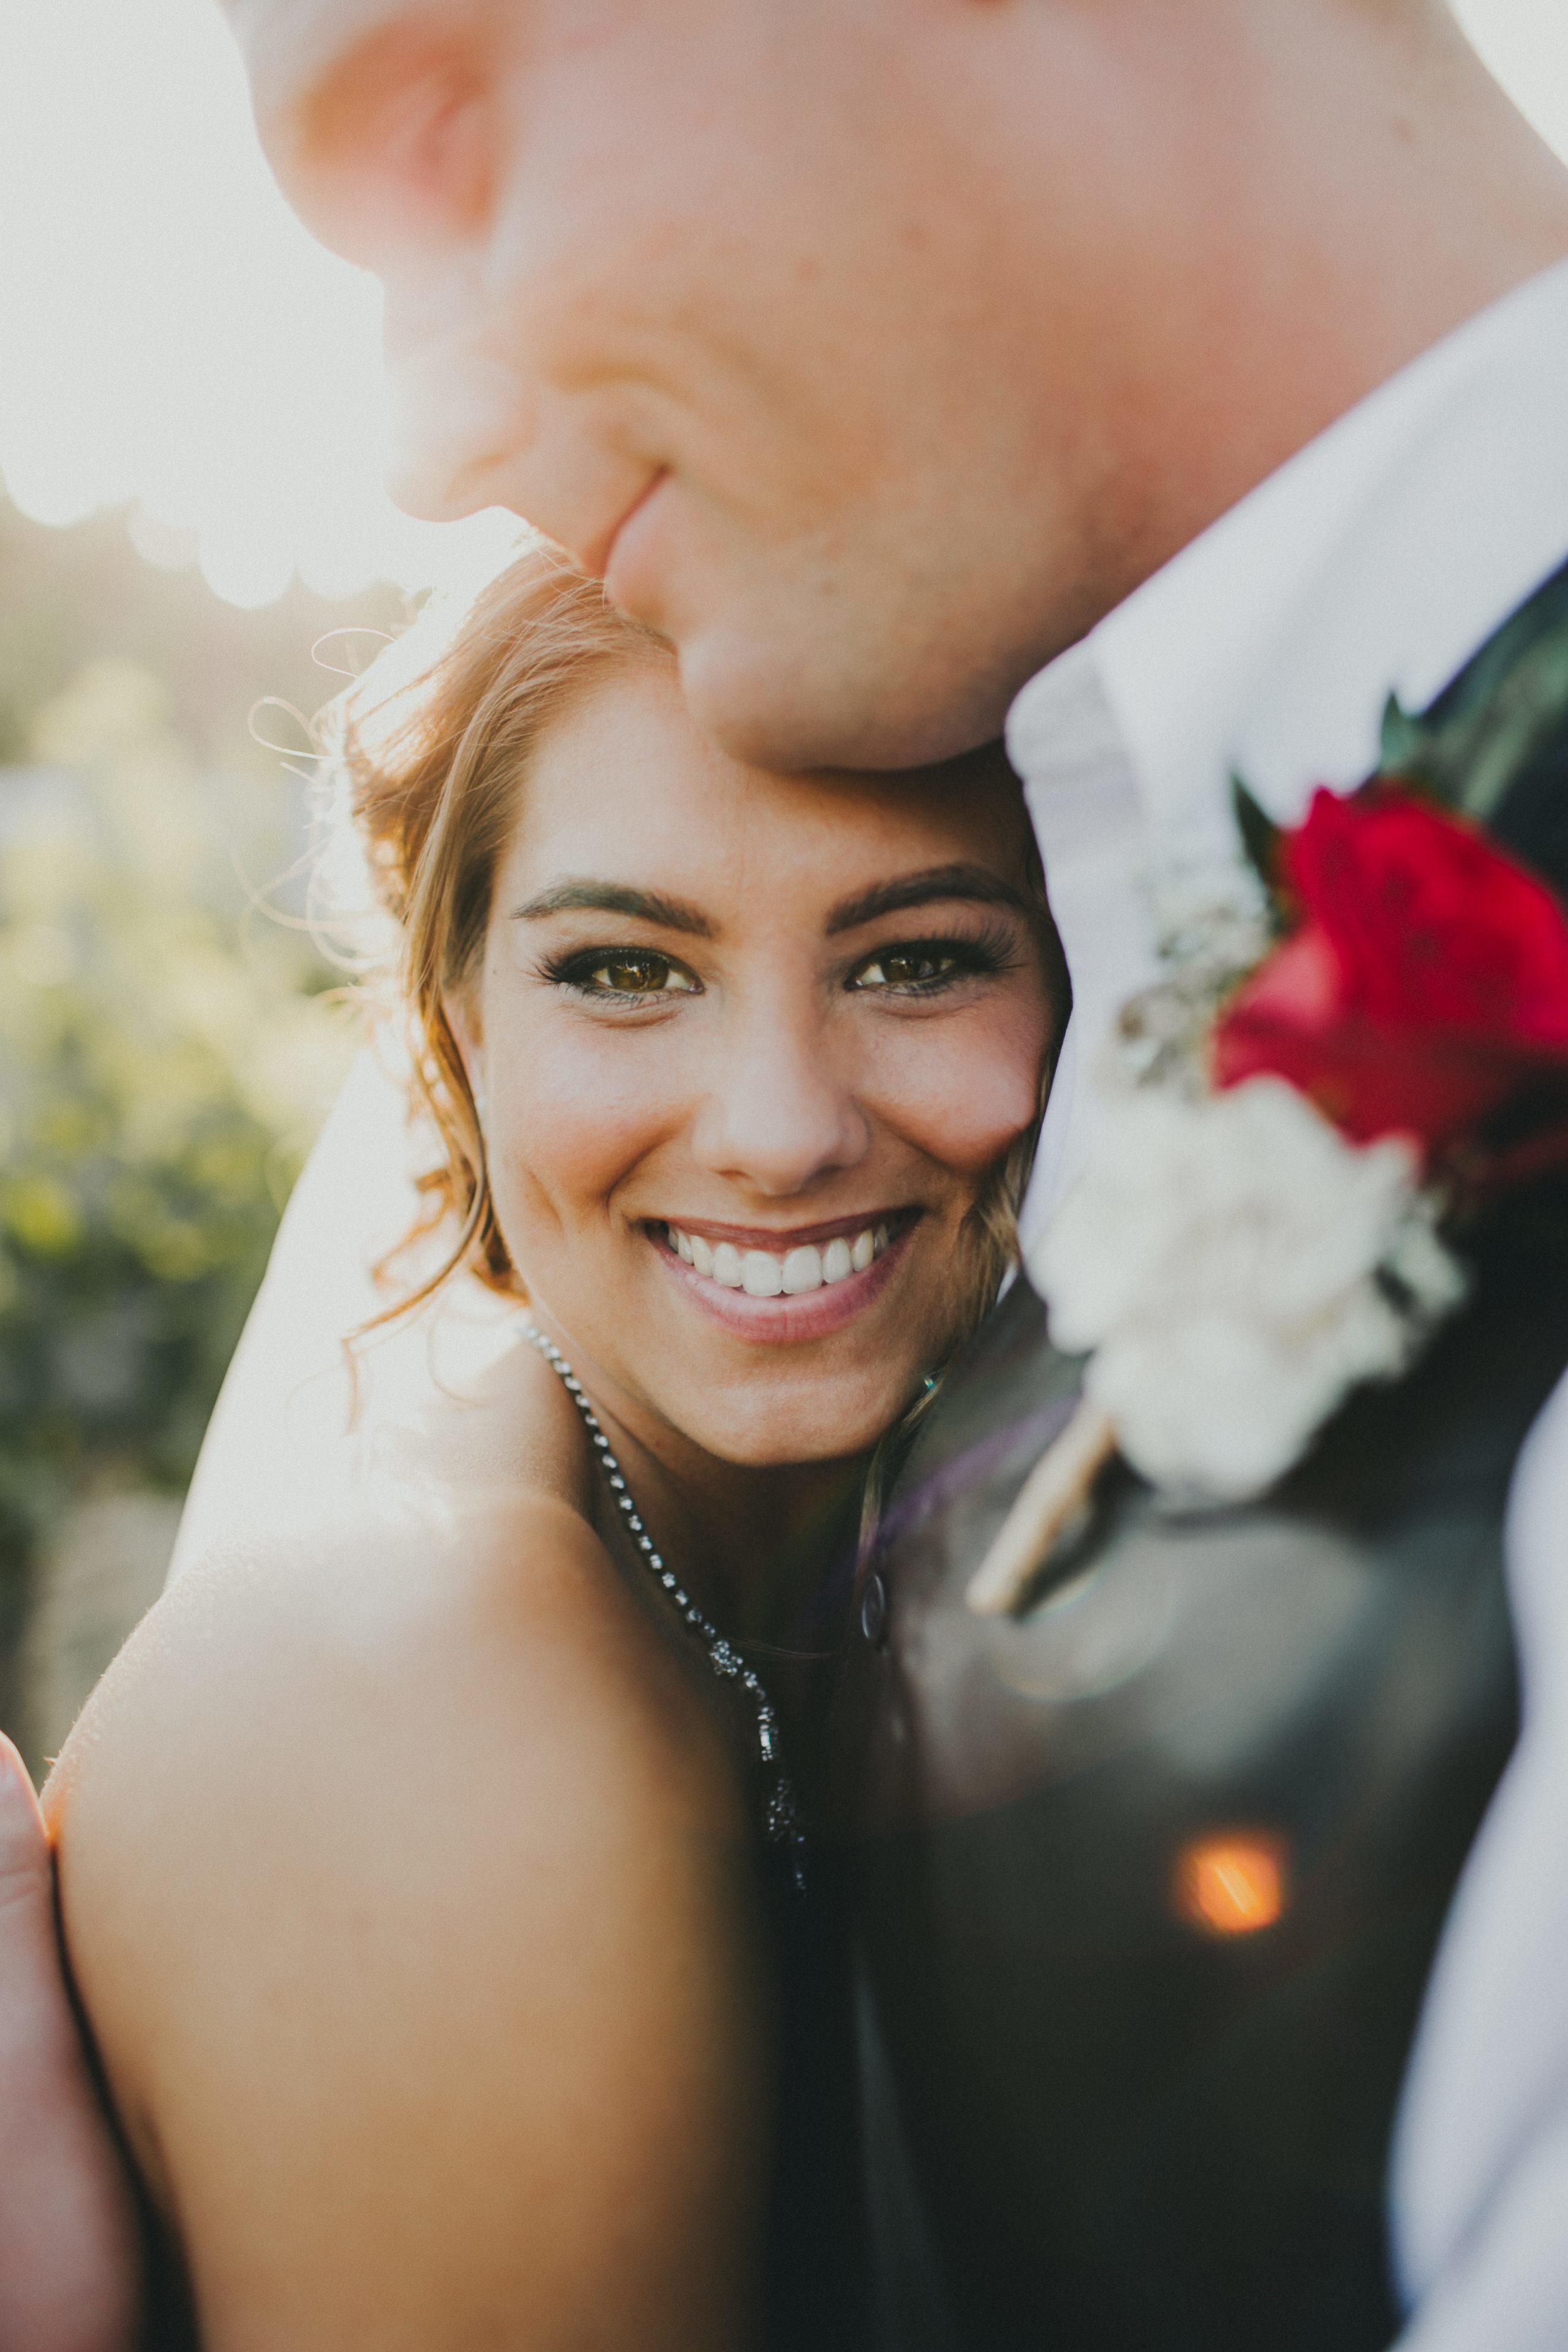 Cheyenne + Jordan - Wedding, Natalie Griffo (86 of 157).jpg